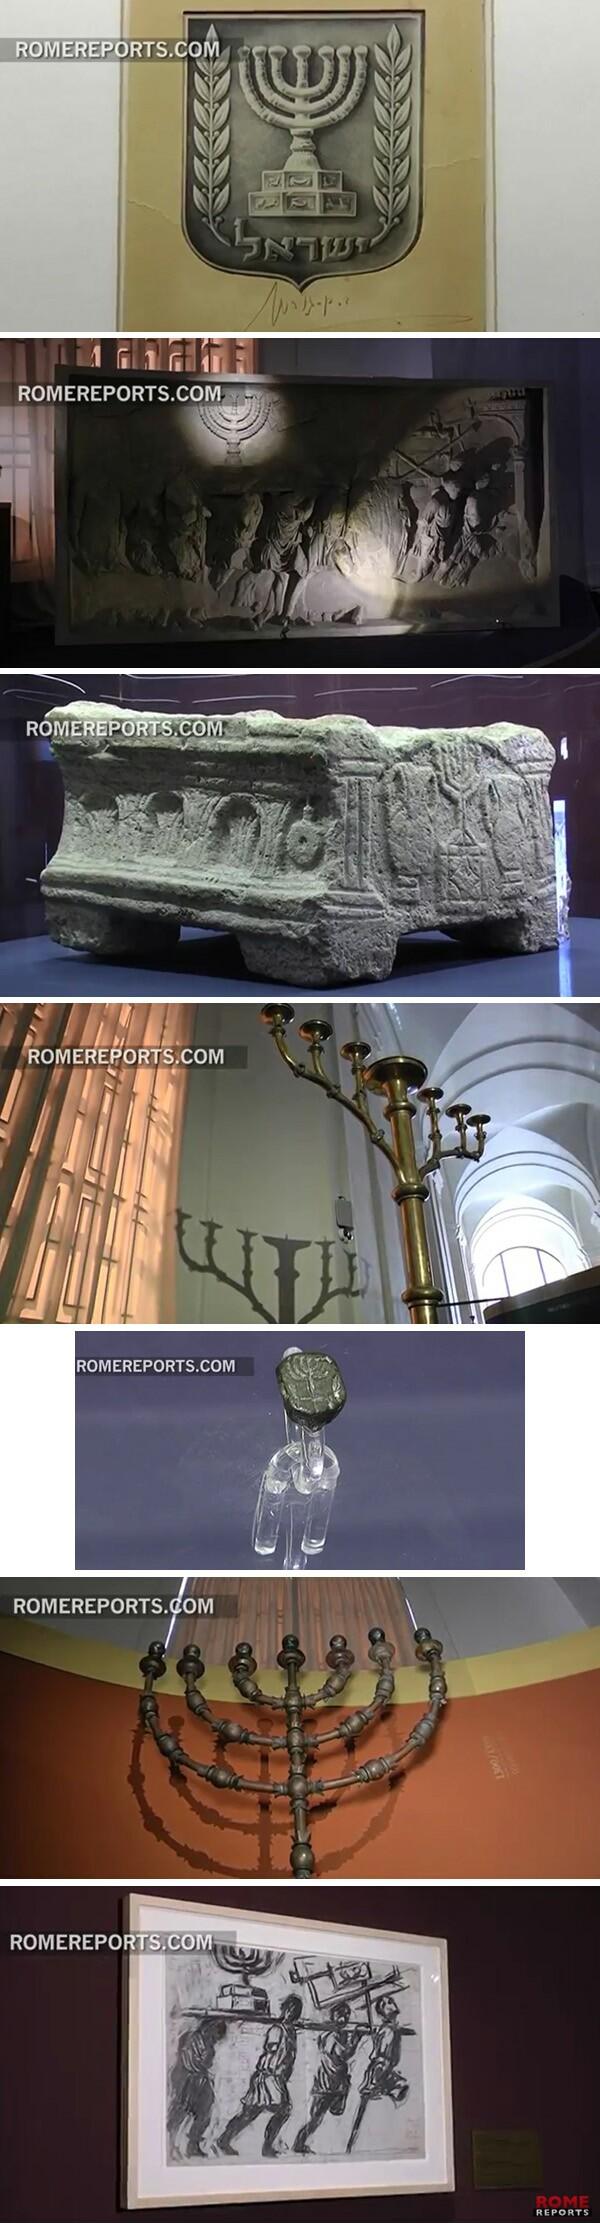 Menorah exhibit at Vatican 02